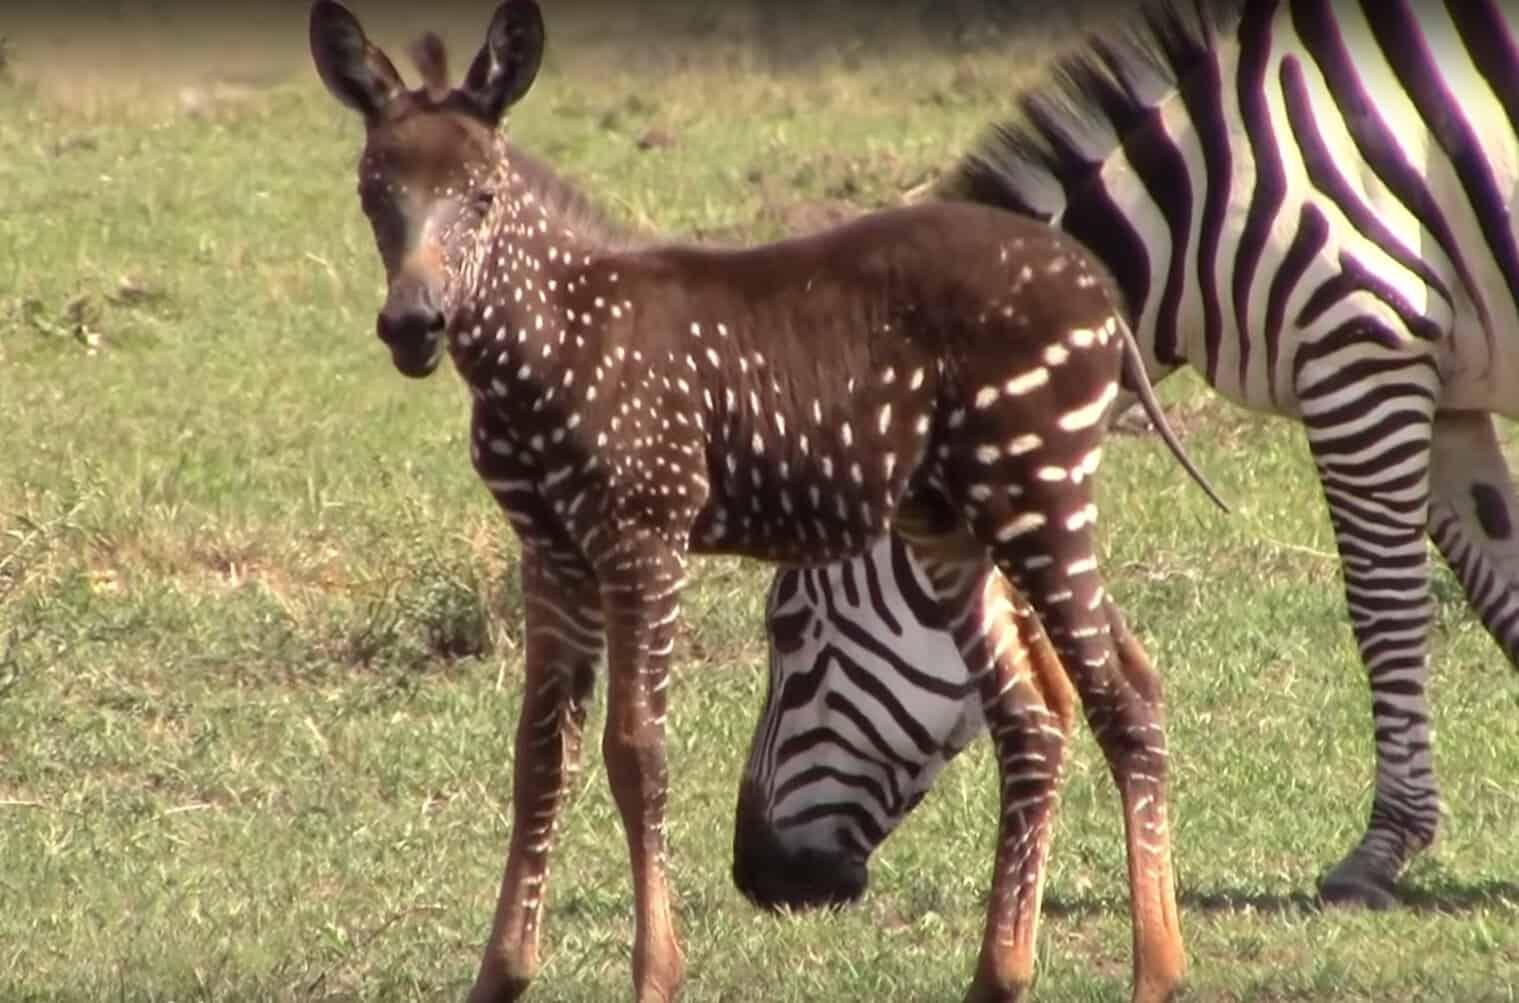 Beautiful Baby Zebra Born With Spots Instead Of Stripes